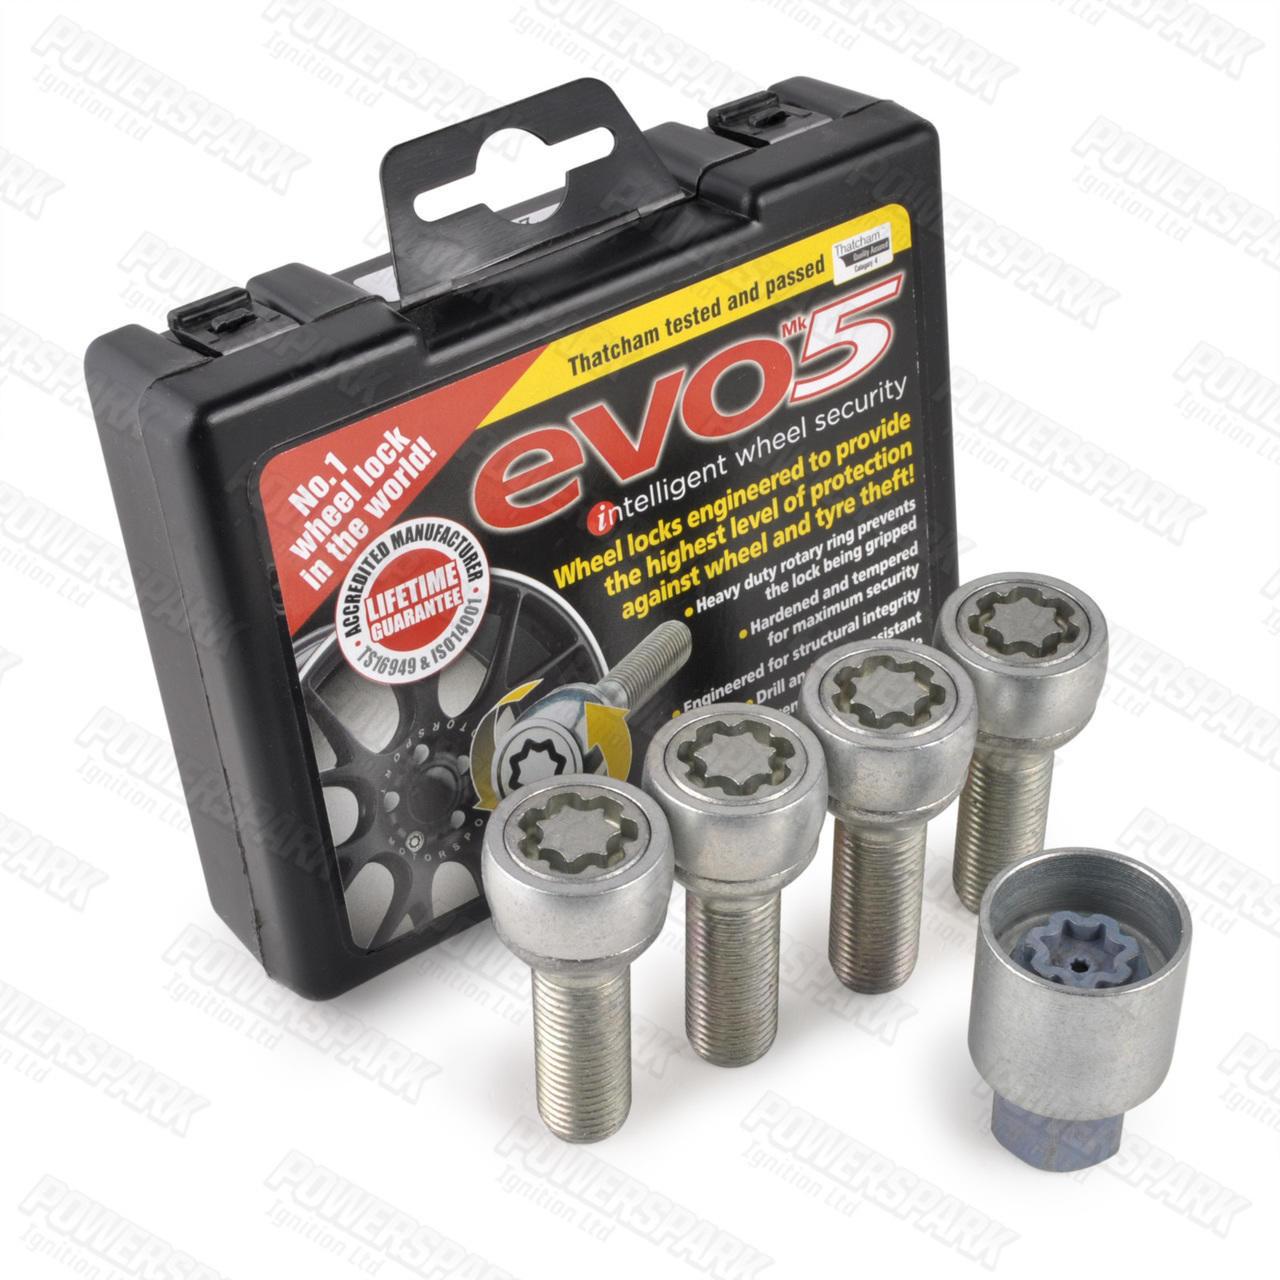 Evo MK5 Evo MK5 Locking Alloy Wheel Bolts 291/5 for Volkswagen T4 Transporter, Ford Galaxy and VW Sharan